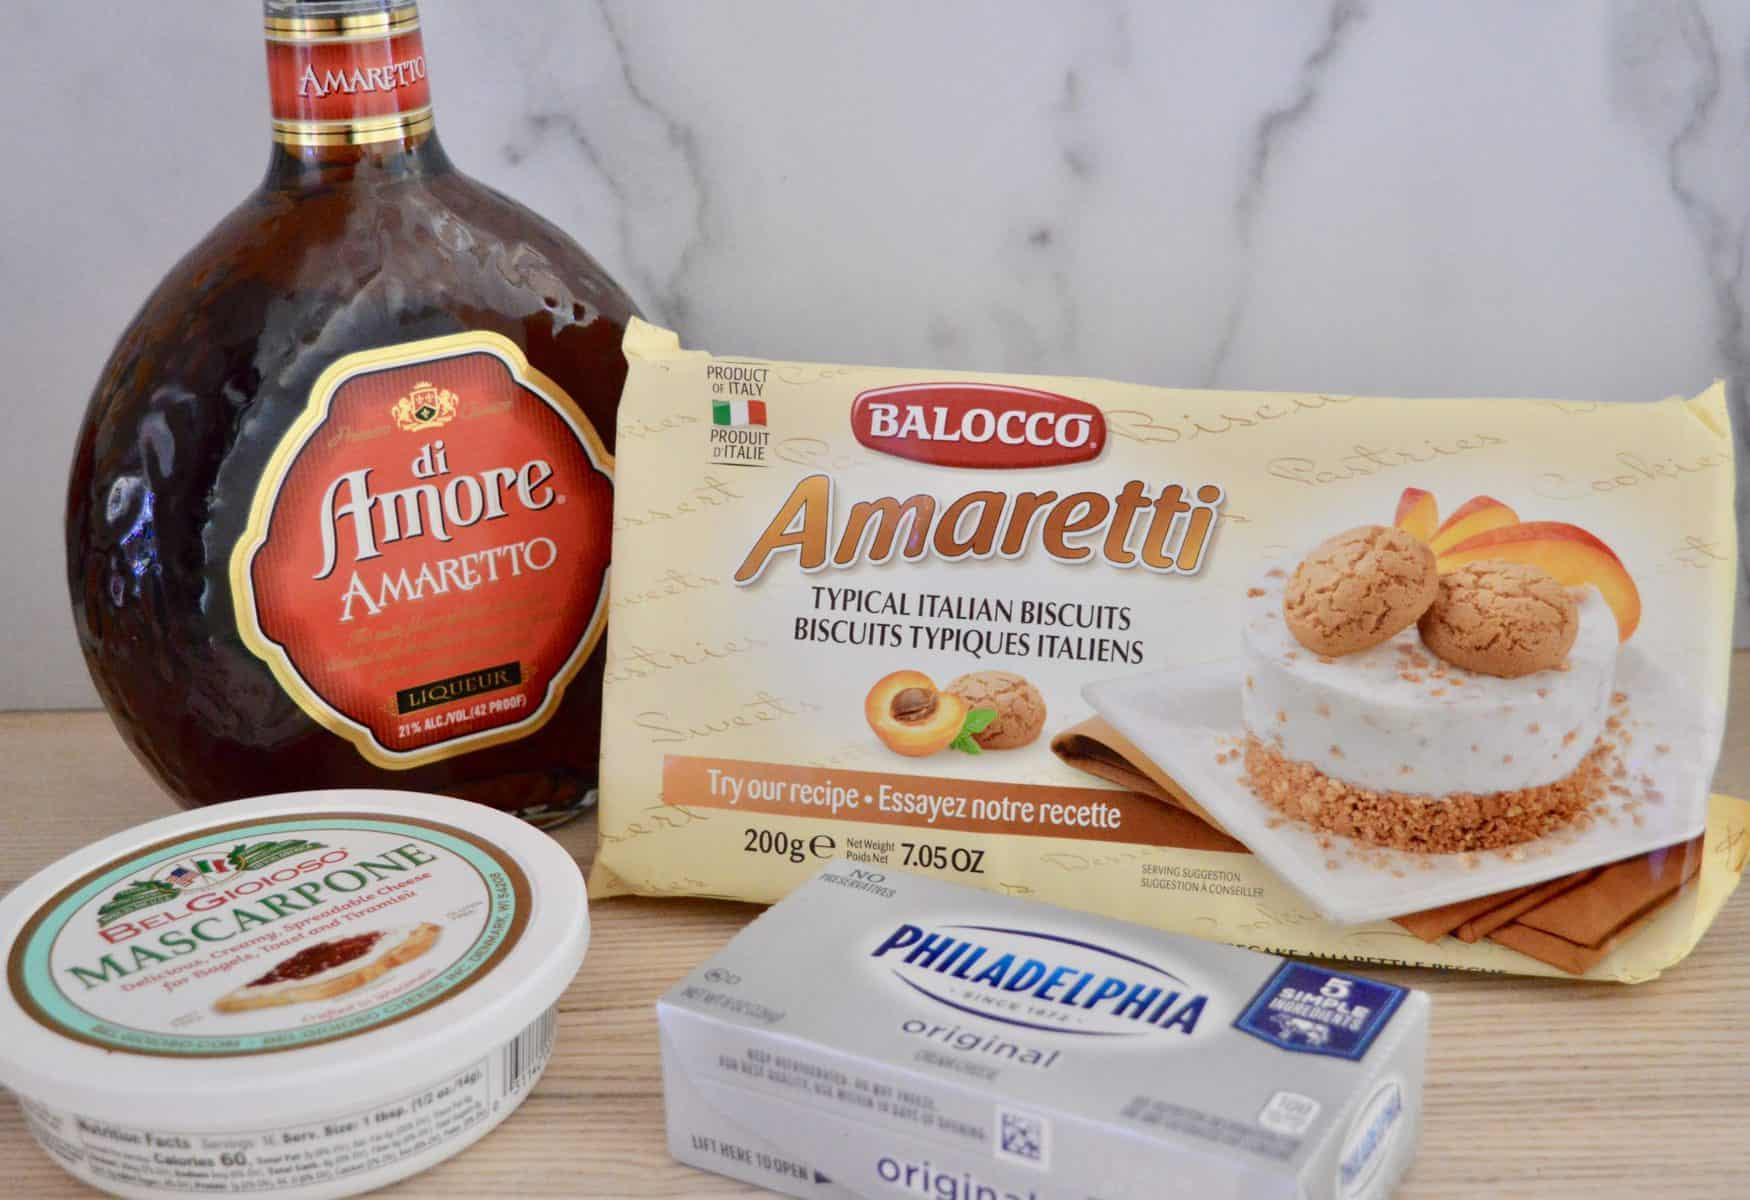 amaretti cookies, amaretto liqueur, mascarpone cheese, and cream cheese on a counter.